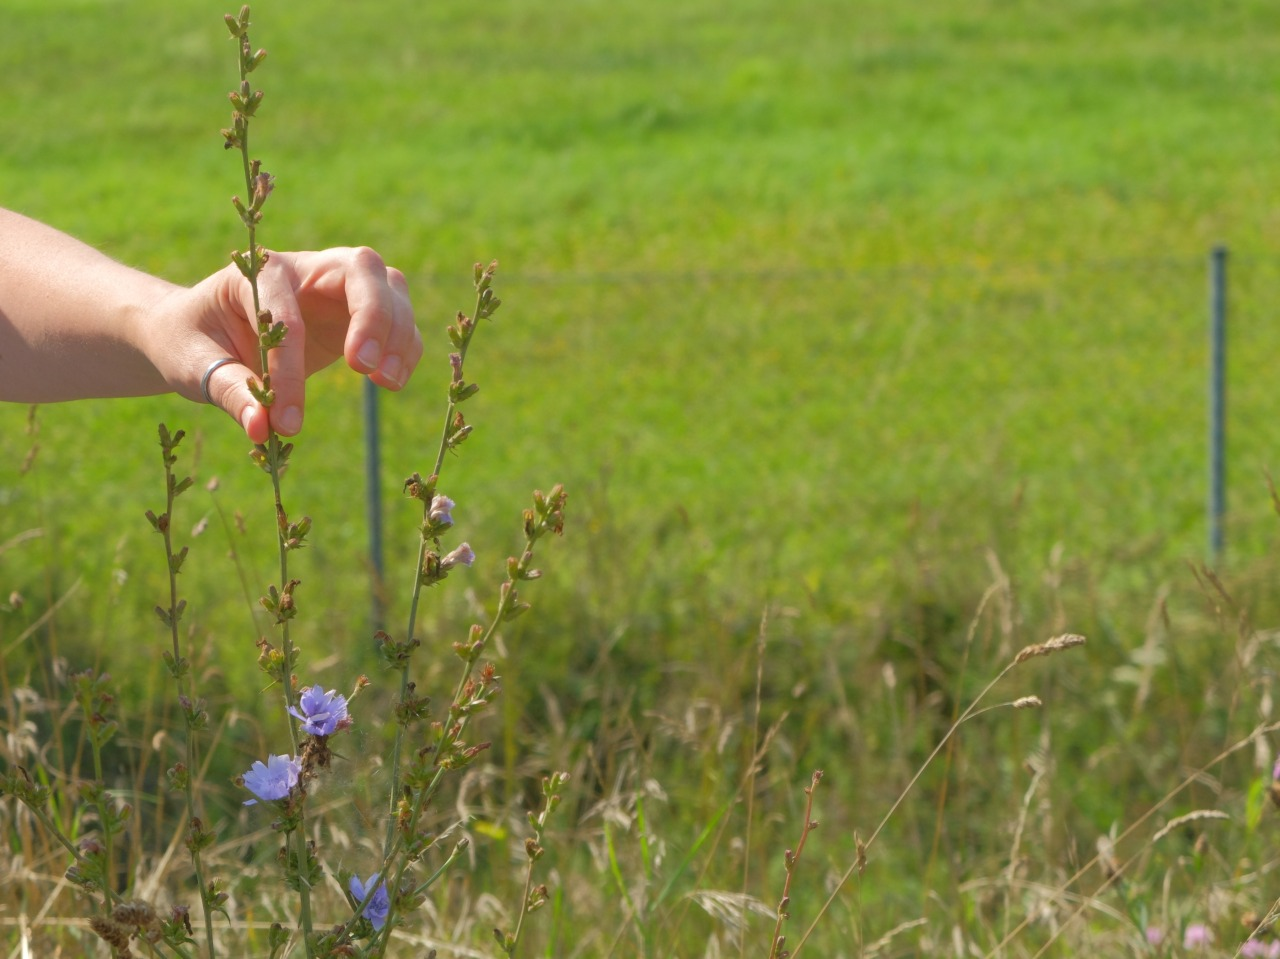 mangia minga // 'Wildkräuter: Foraging Wild Herbs' Wegwarte - wild chicory